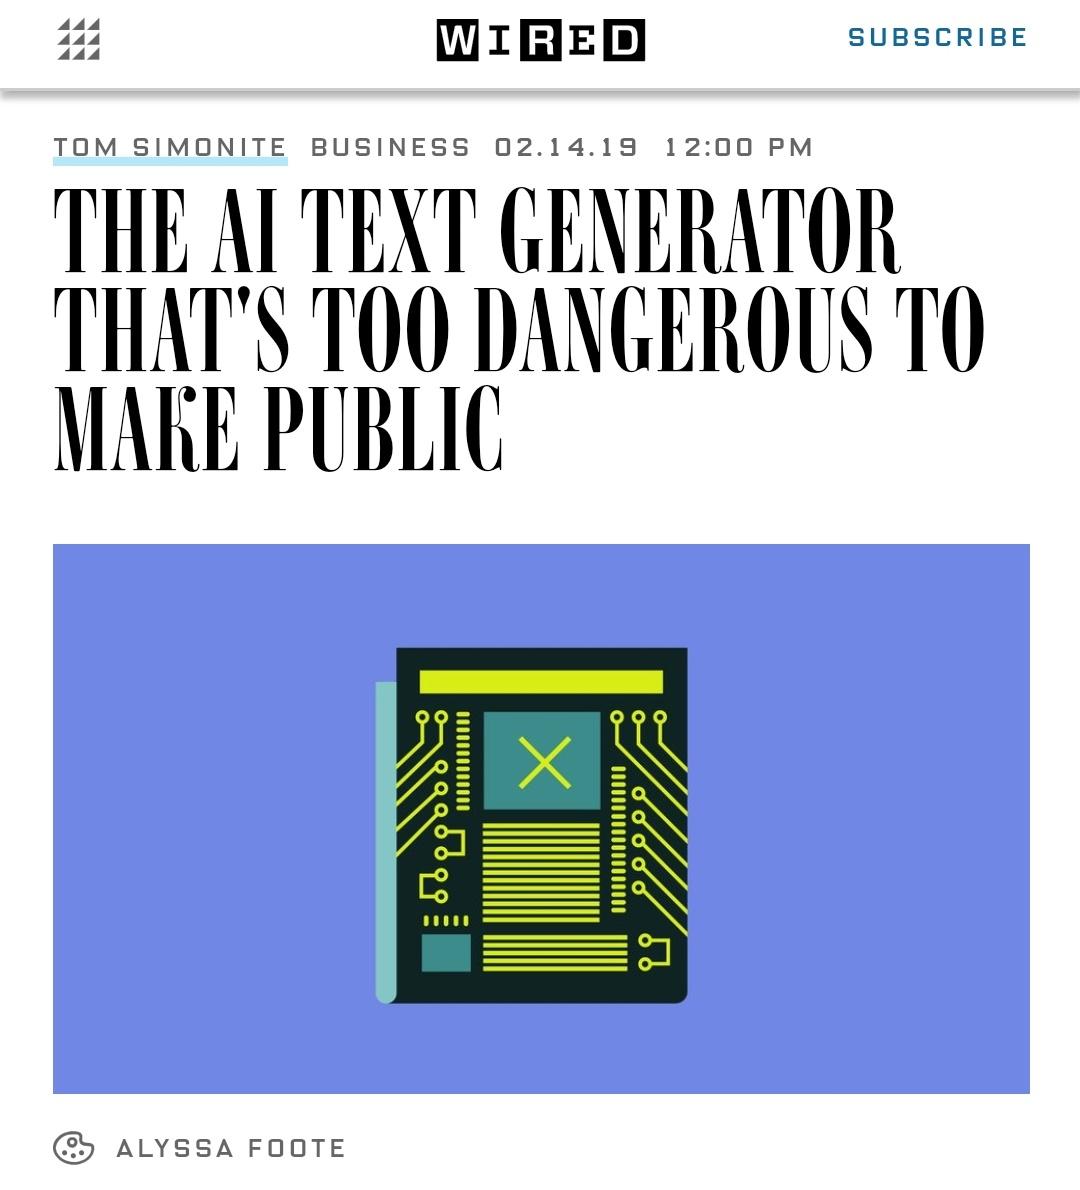 THE AI TEXT GENERATOR THAT'S TOO DANGEROUS TO MAKE PUBLICv - FIAKS